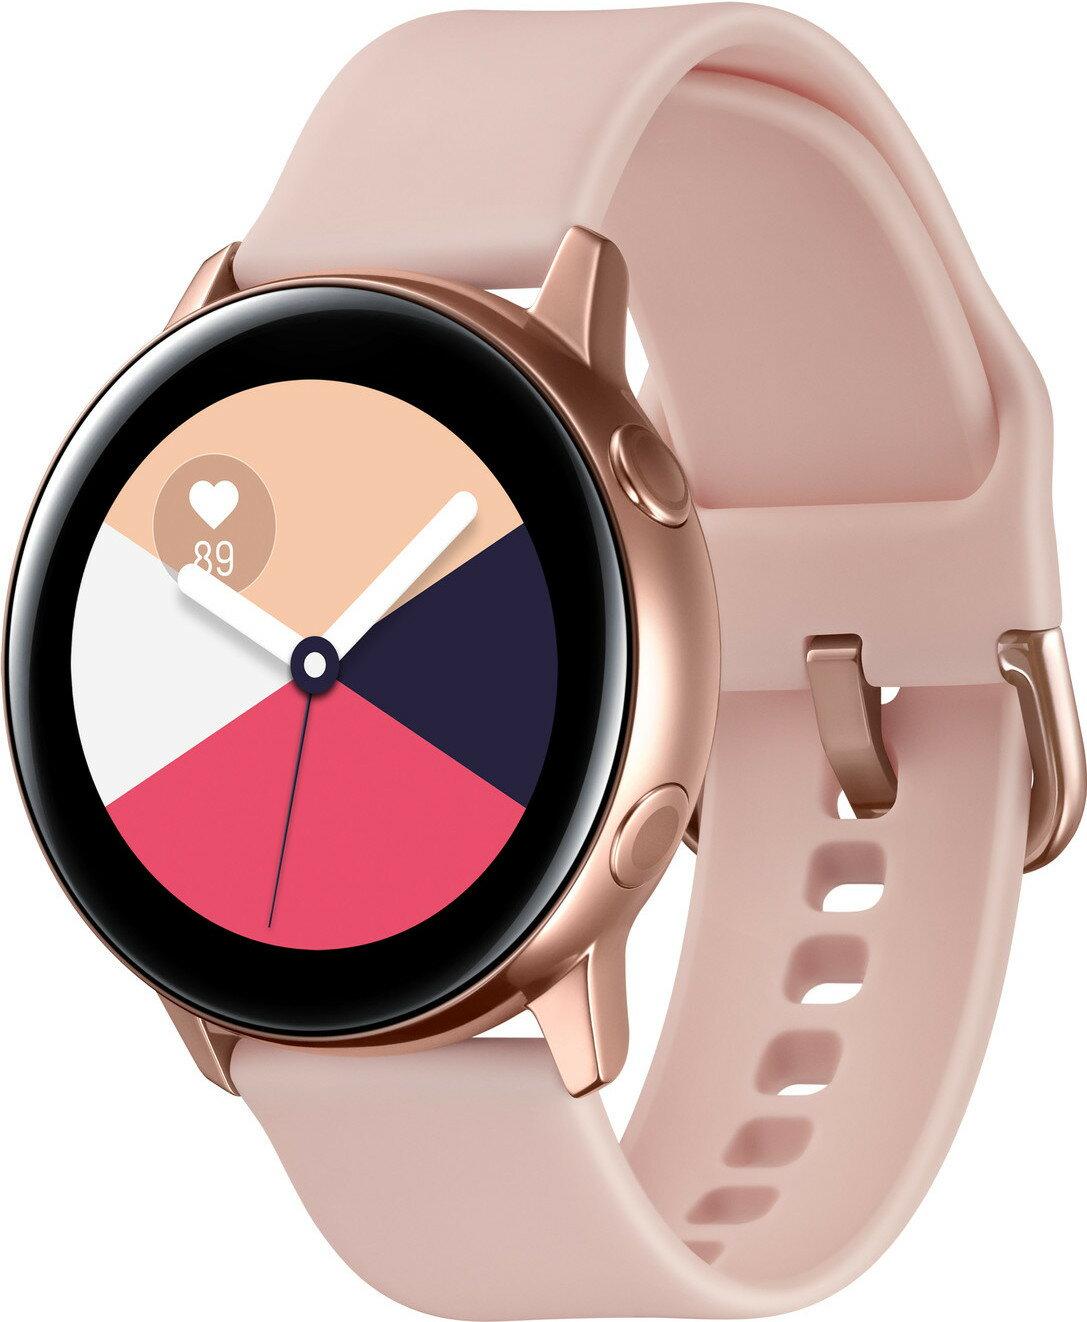 Sobeonline1 Samsung Galaxy Watch Active R500 4gb Smartwatch Rose